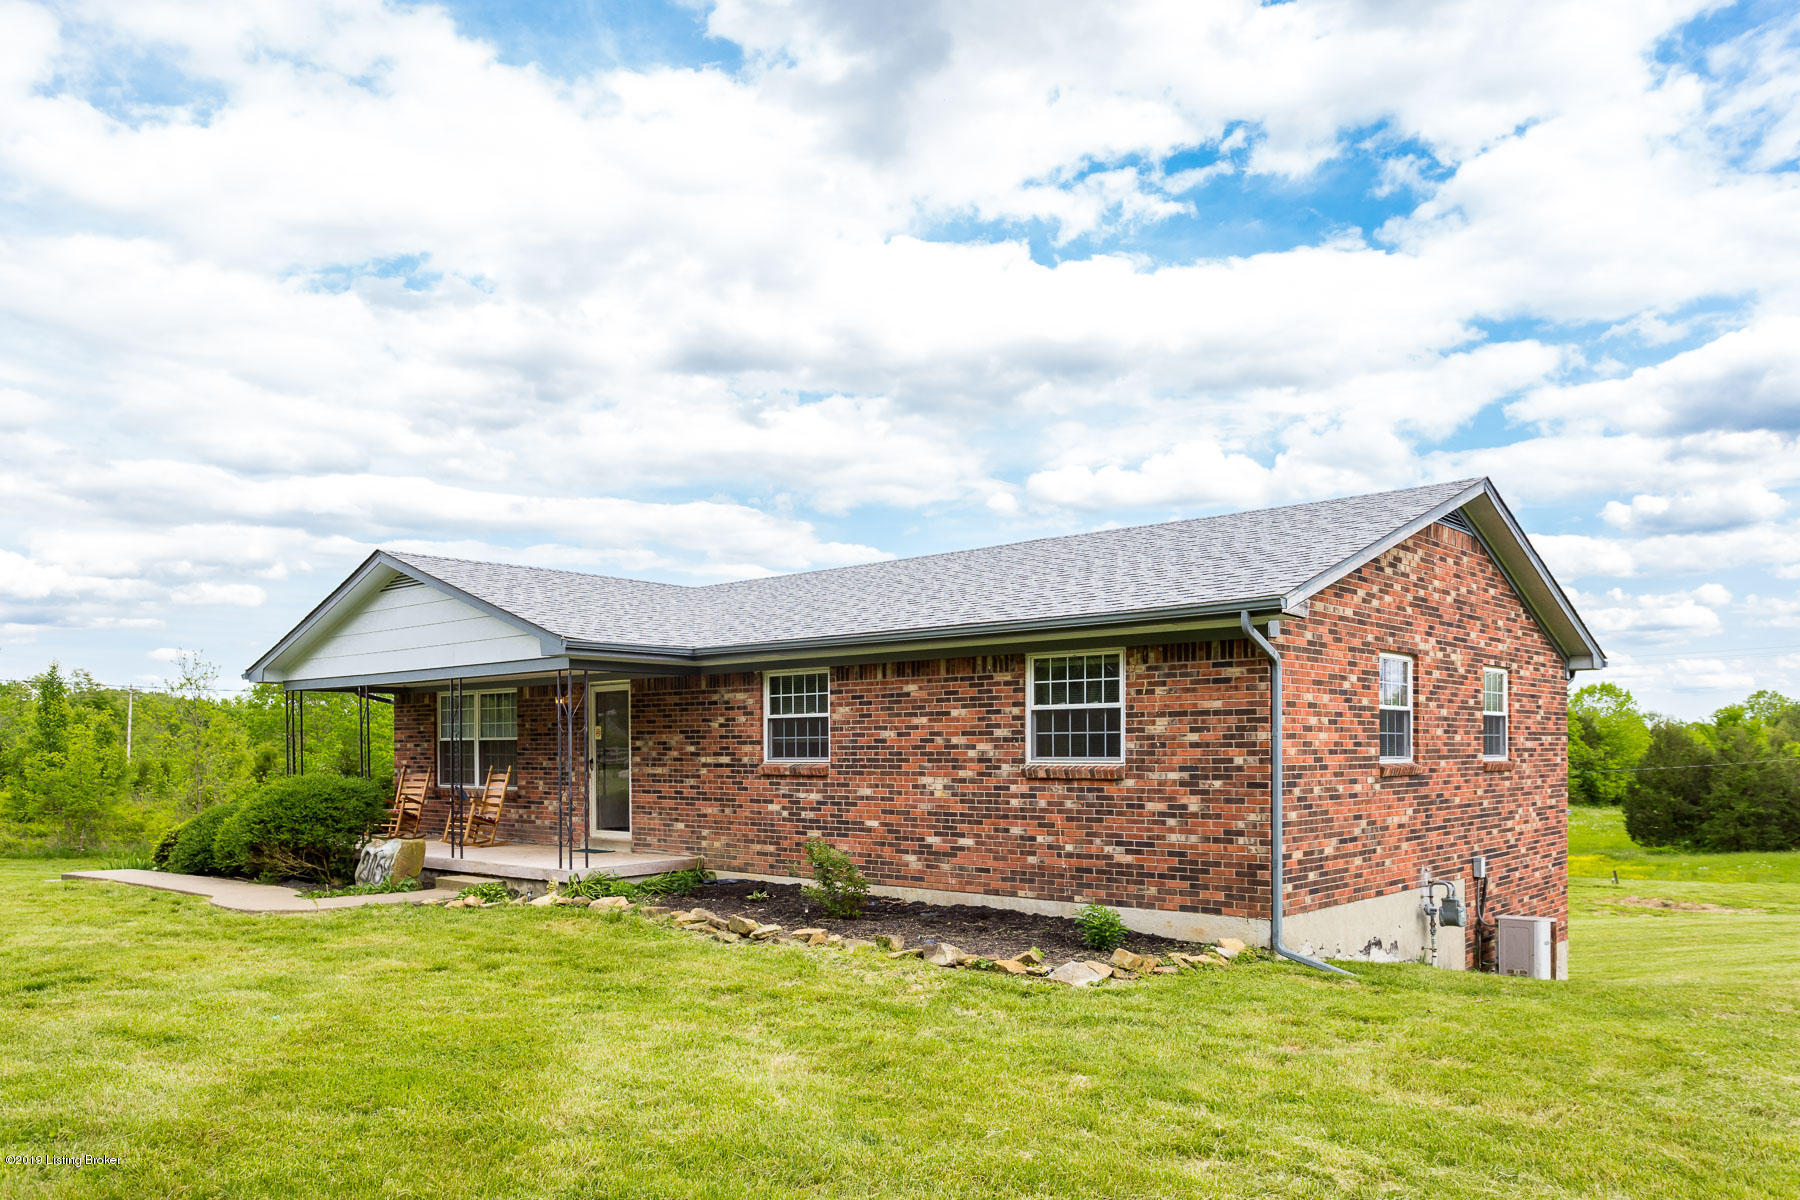 2059 Raymond Rd, Shepherdsville, Kentucky 40165, 4 Bedrooms Bedrooms, 10 Rooms Rooms,3 BathroomsBathrooms,Residential,For Sale,Raymond,1531564